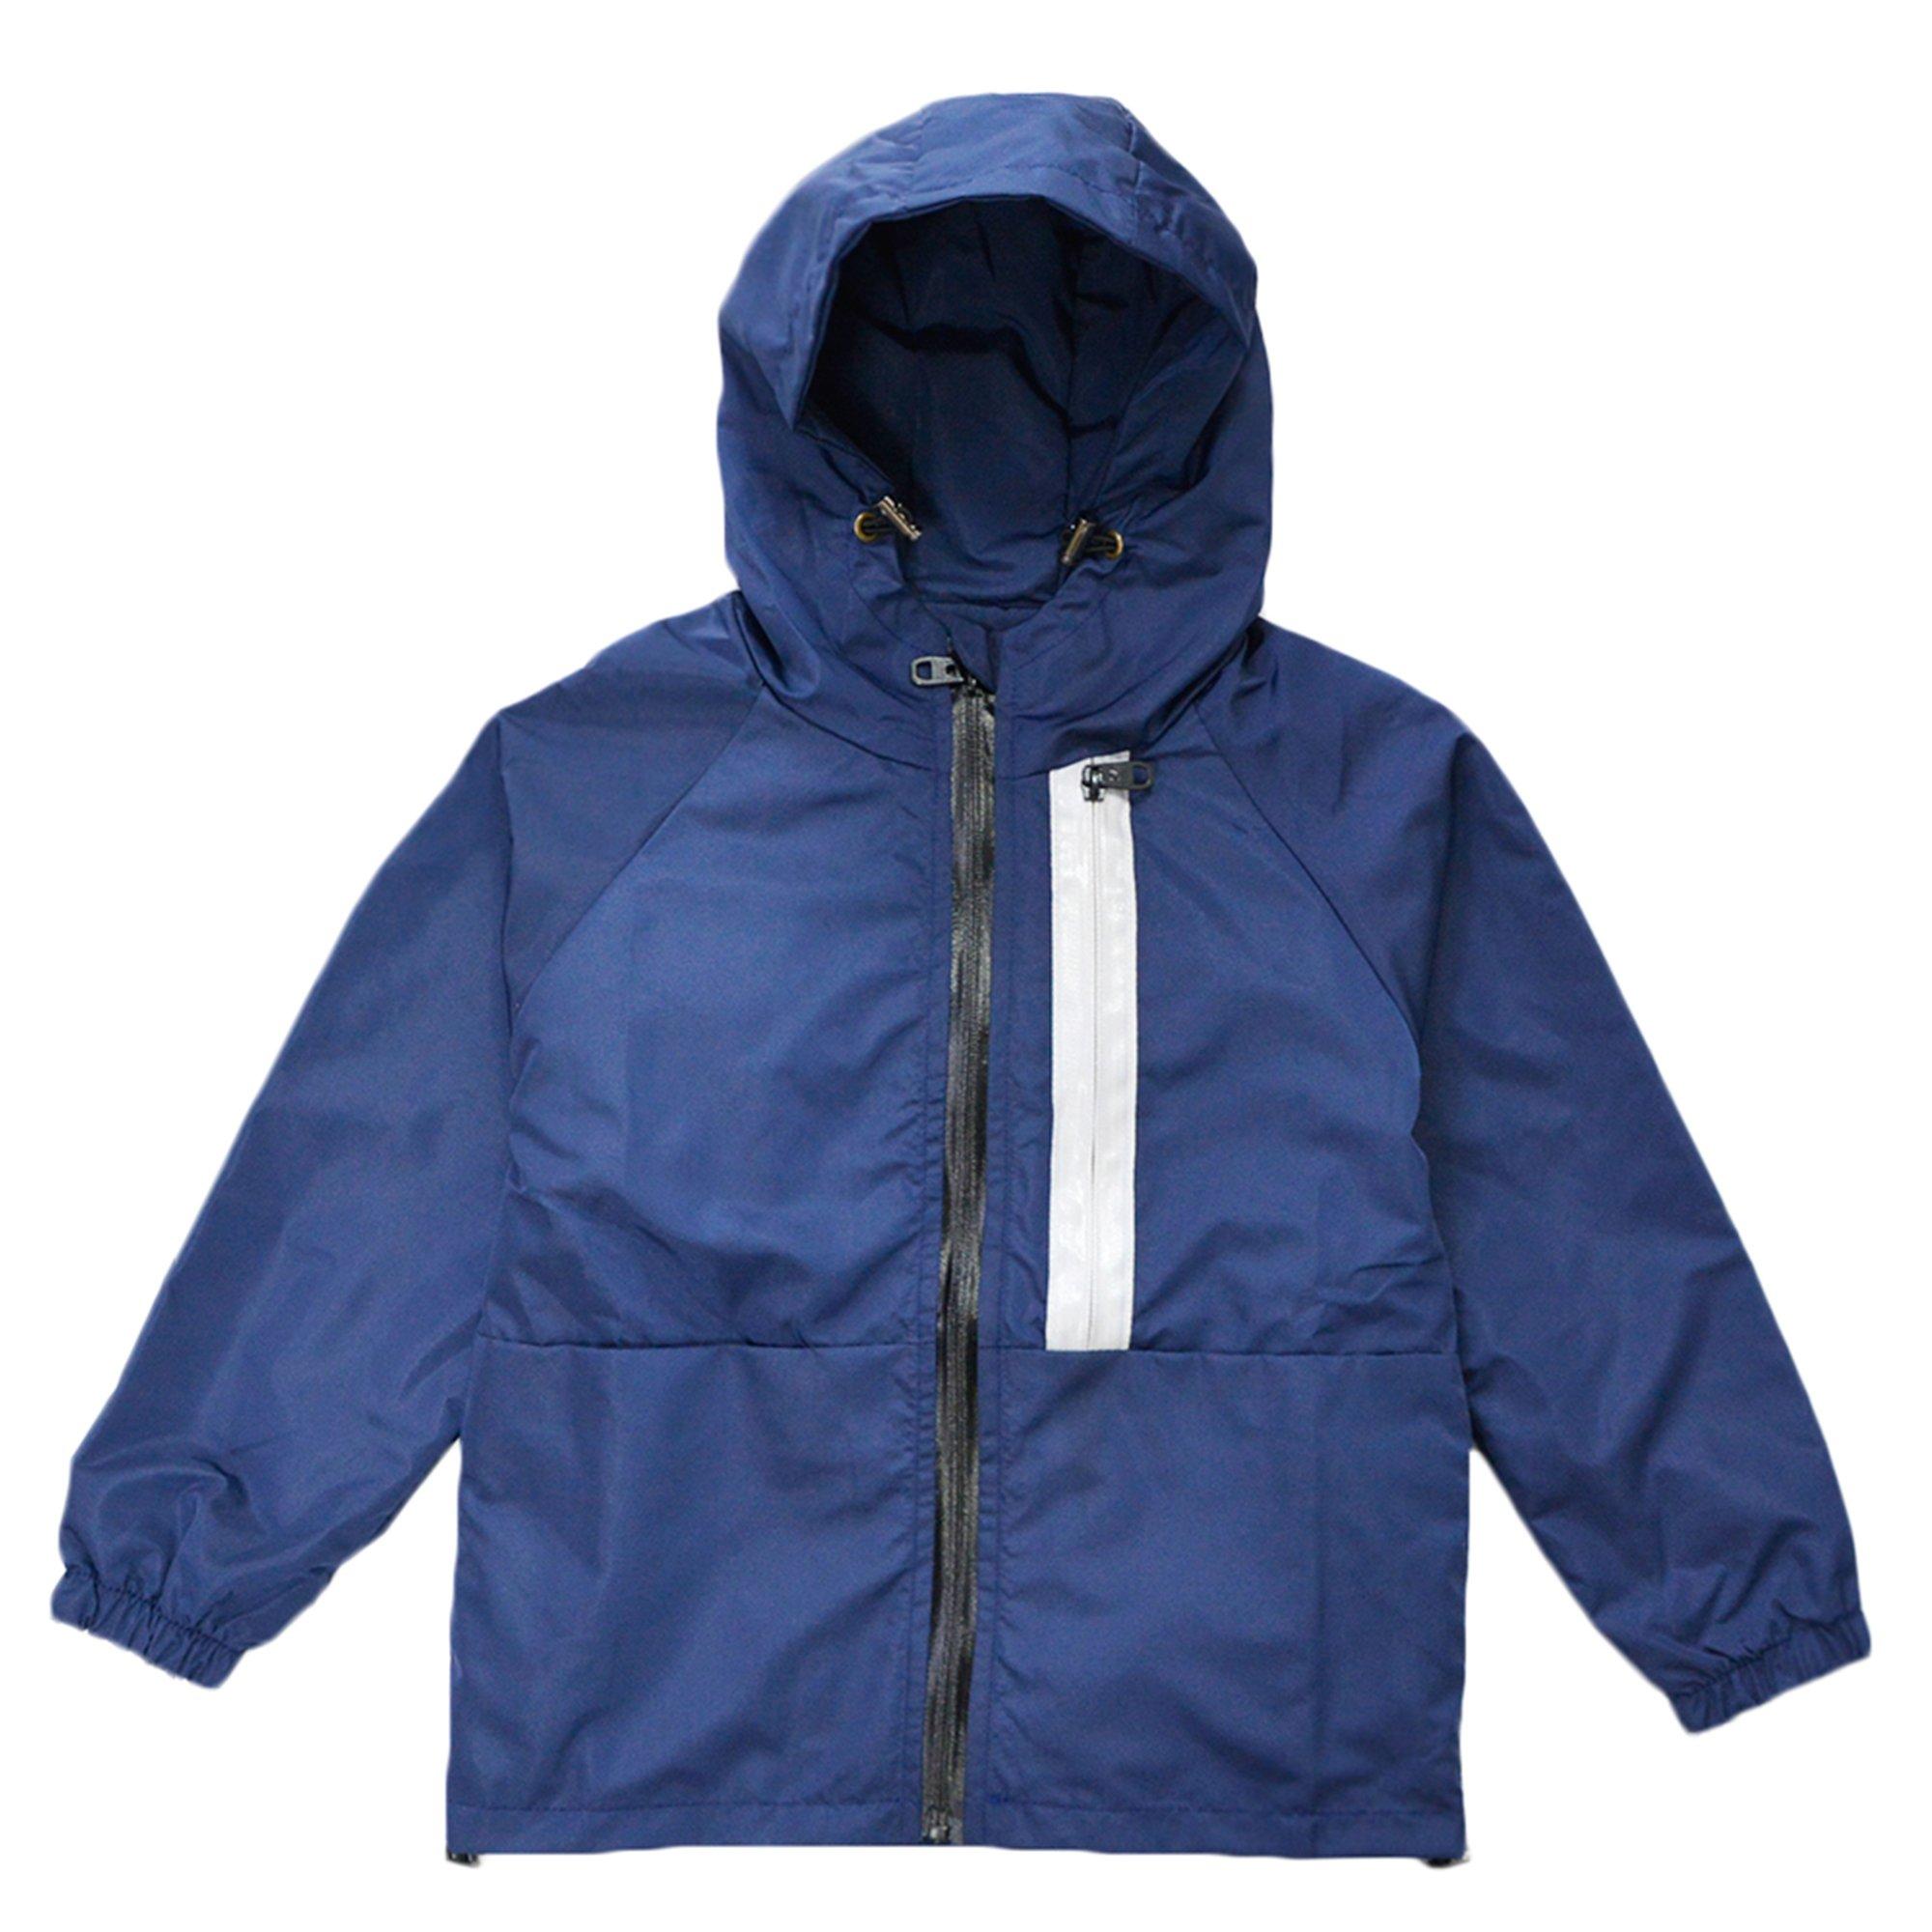 KISBINI Boys Kids Hooded Zip Jacket Coat Spring Dustcoat Windbreaker Children's